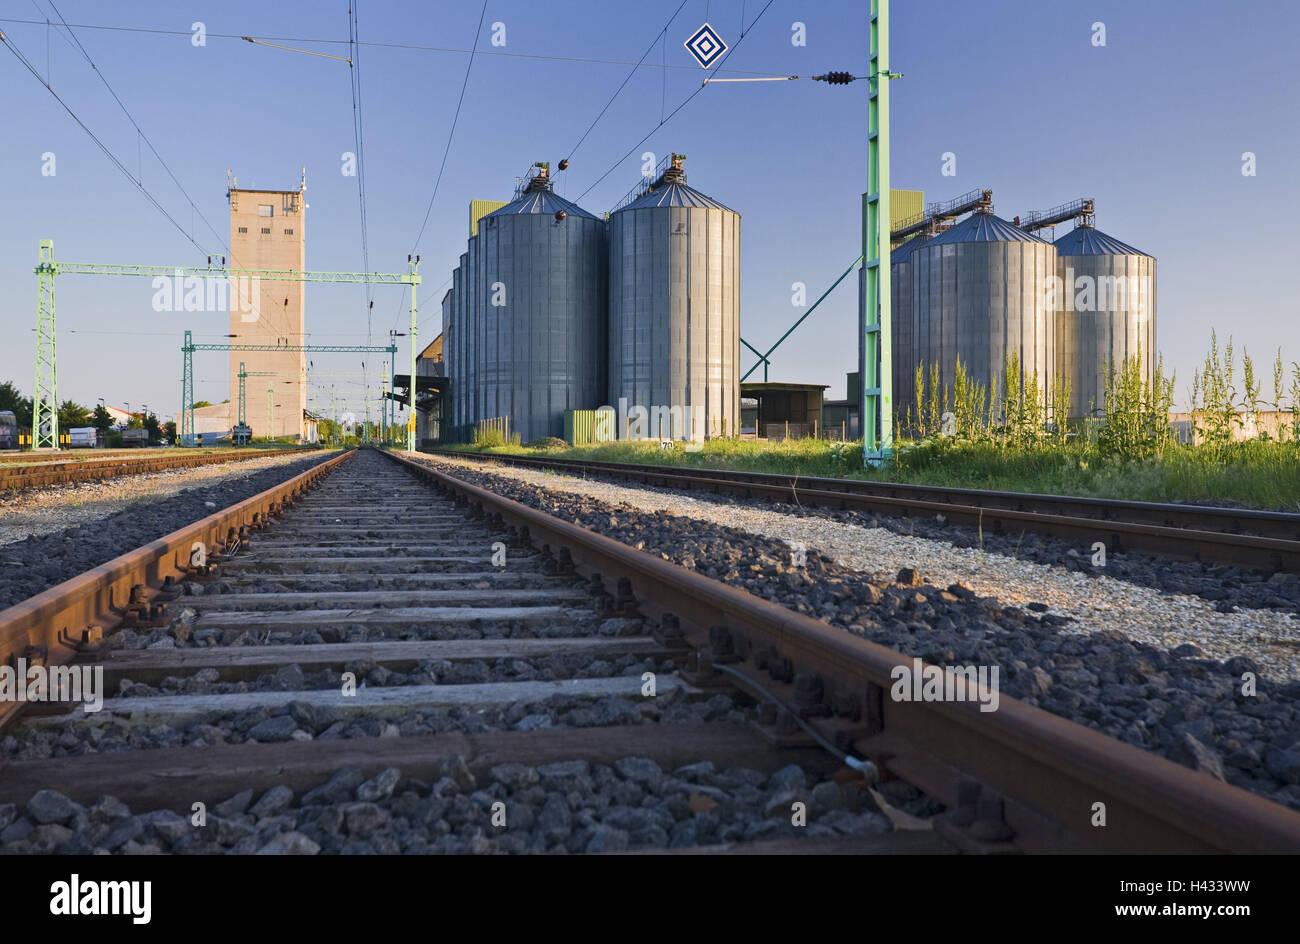 Austria, Burgenland, to catfishes, trajectory rails, - Stock Image